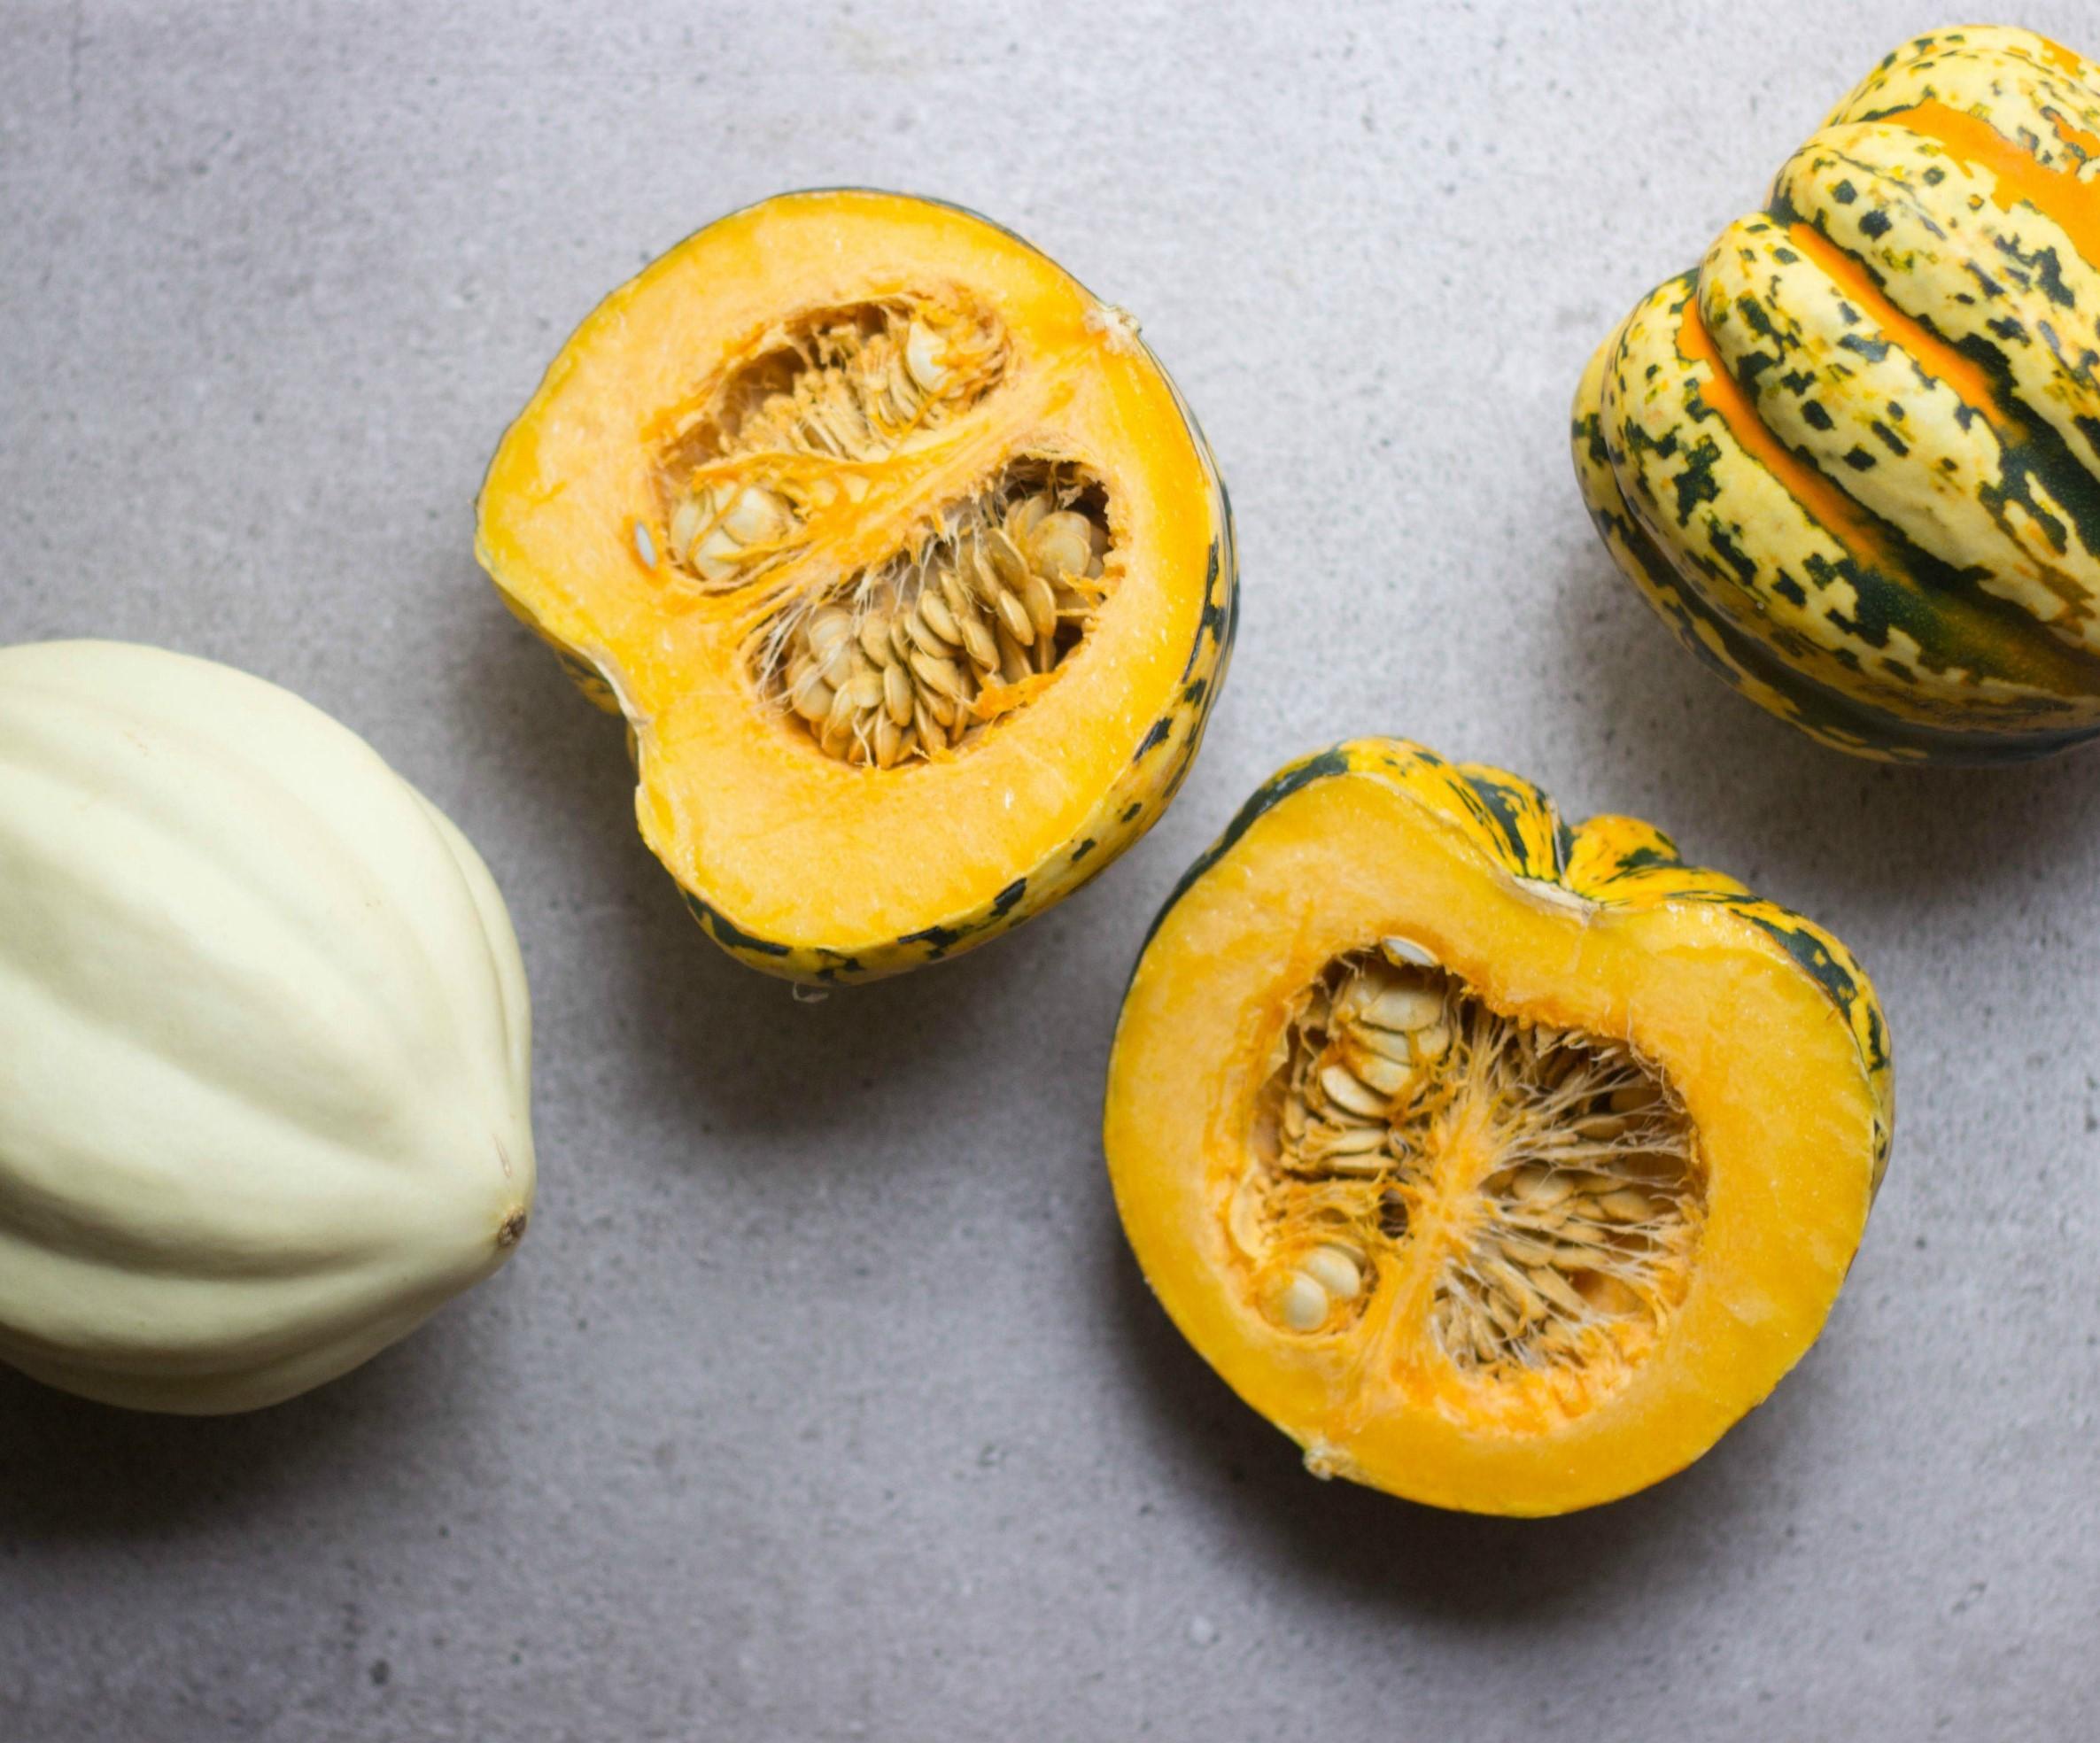 Seasonal Cooking & Nutrition Series: Winter Squash